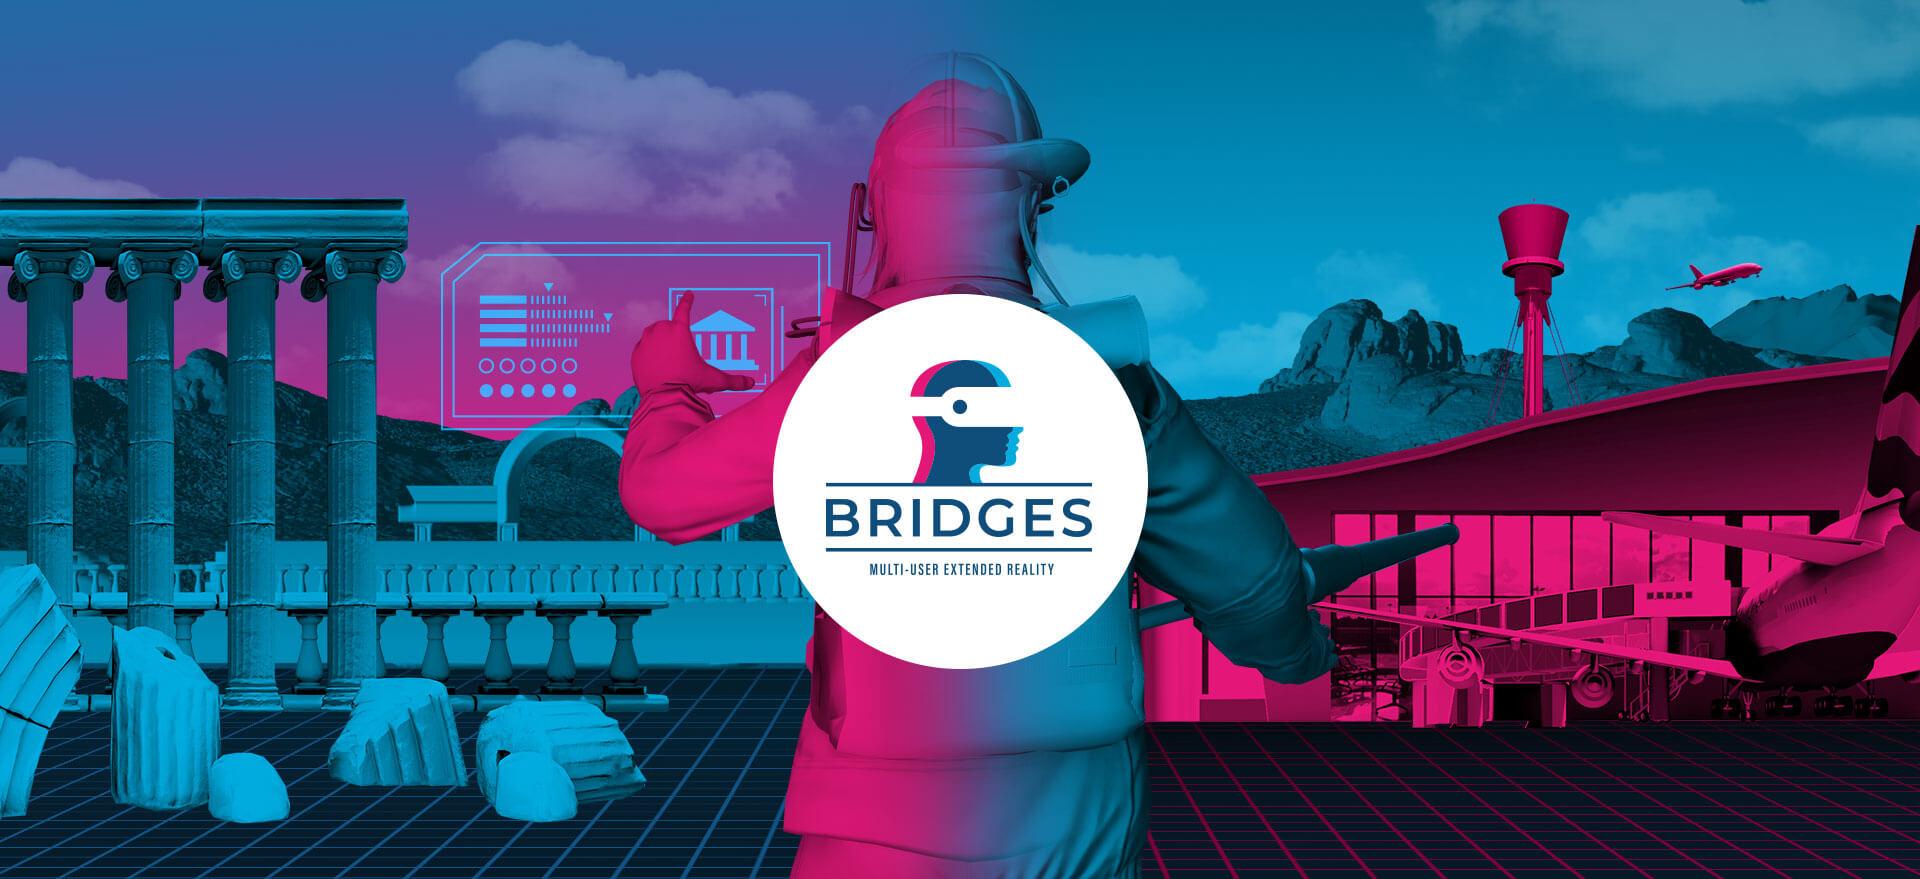 zerouno-design-Bridges-header